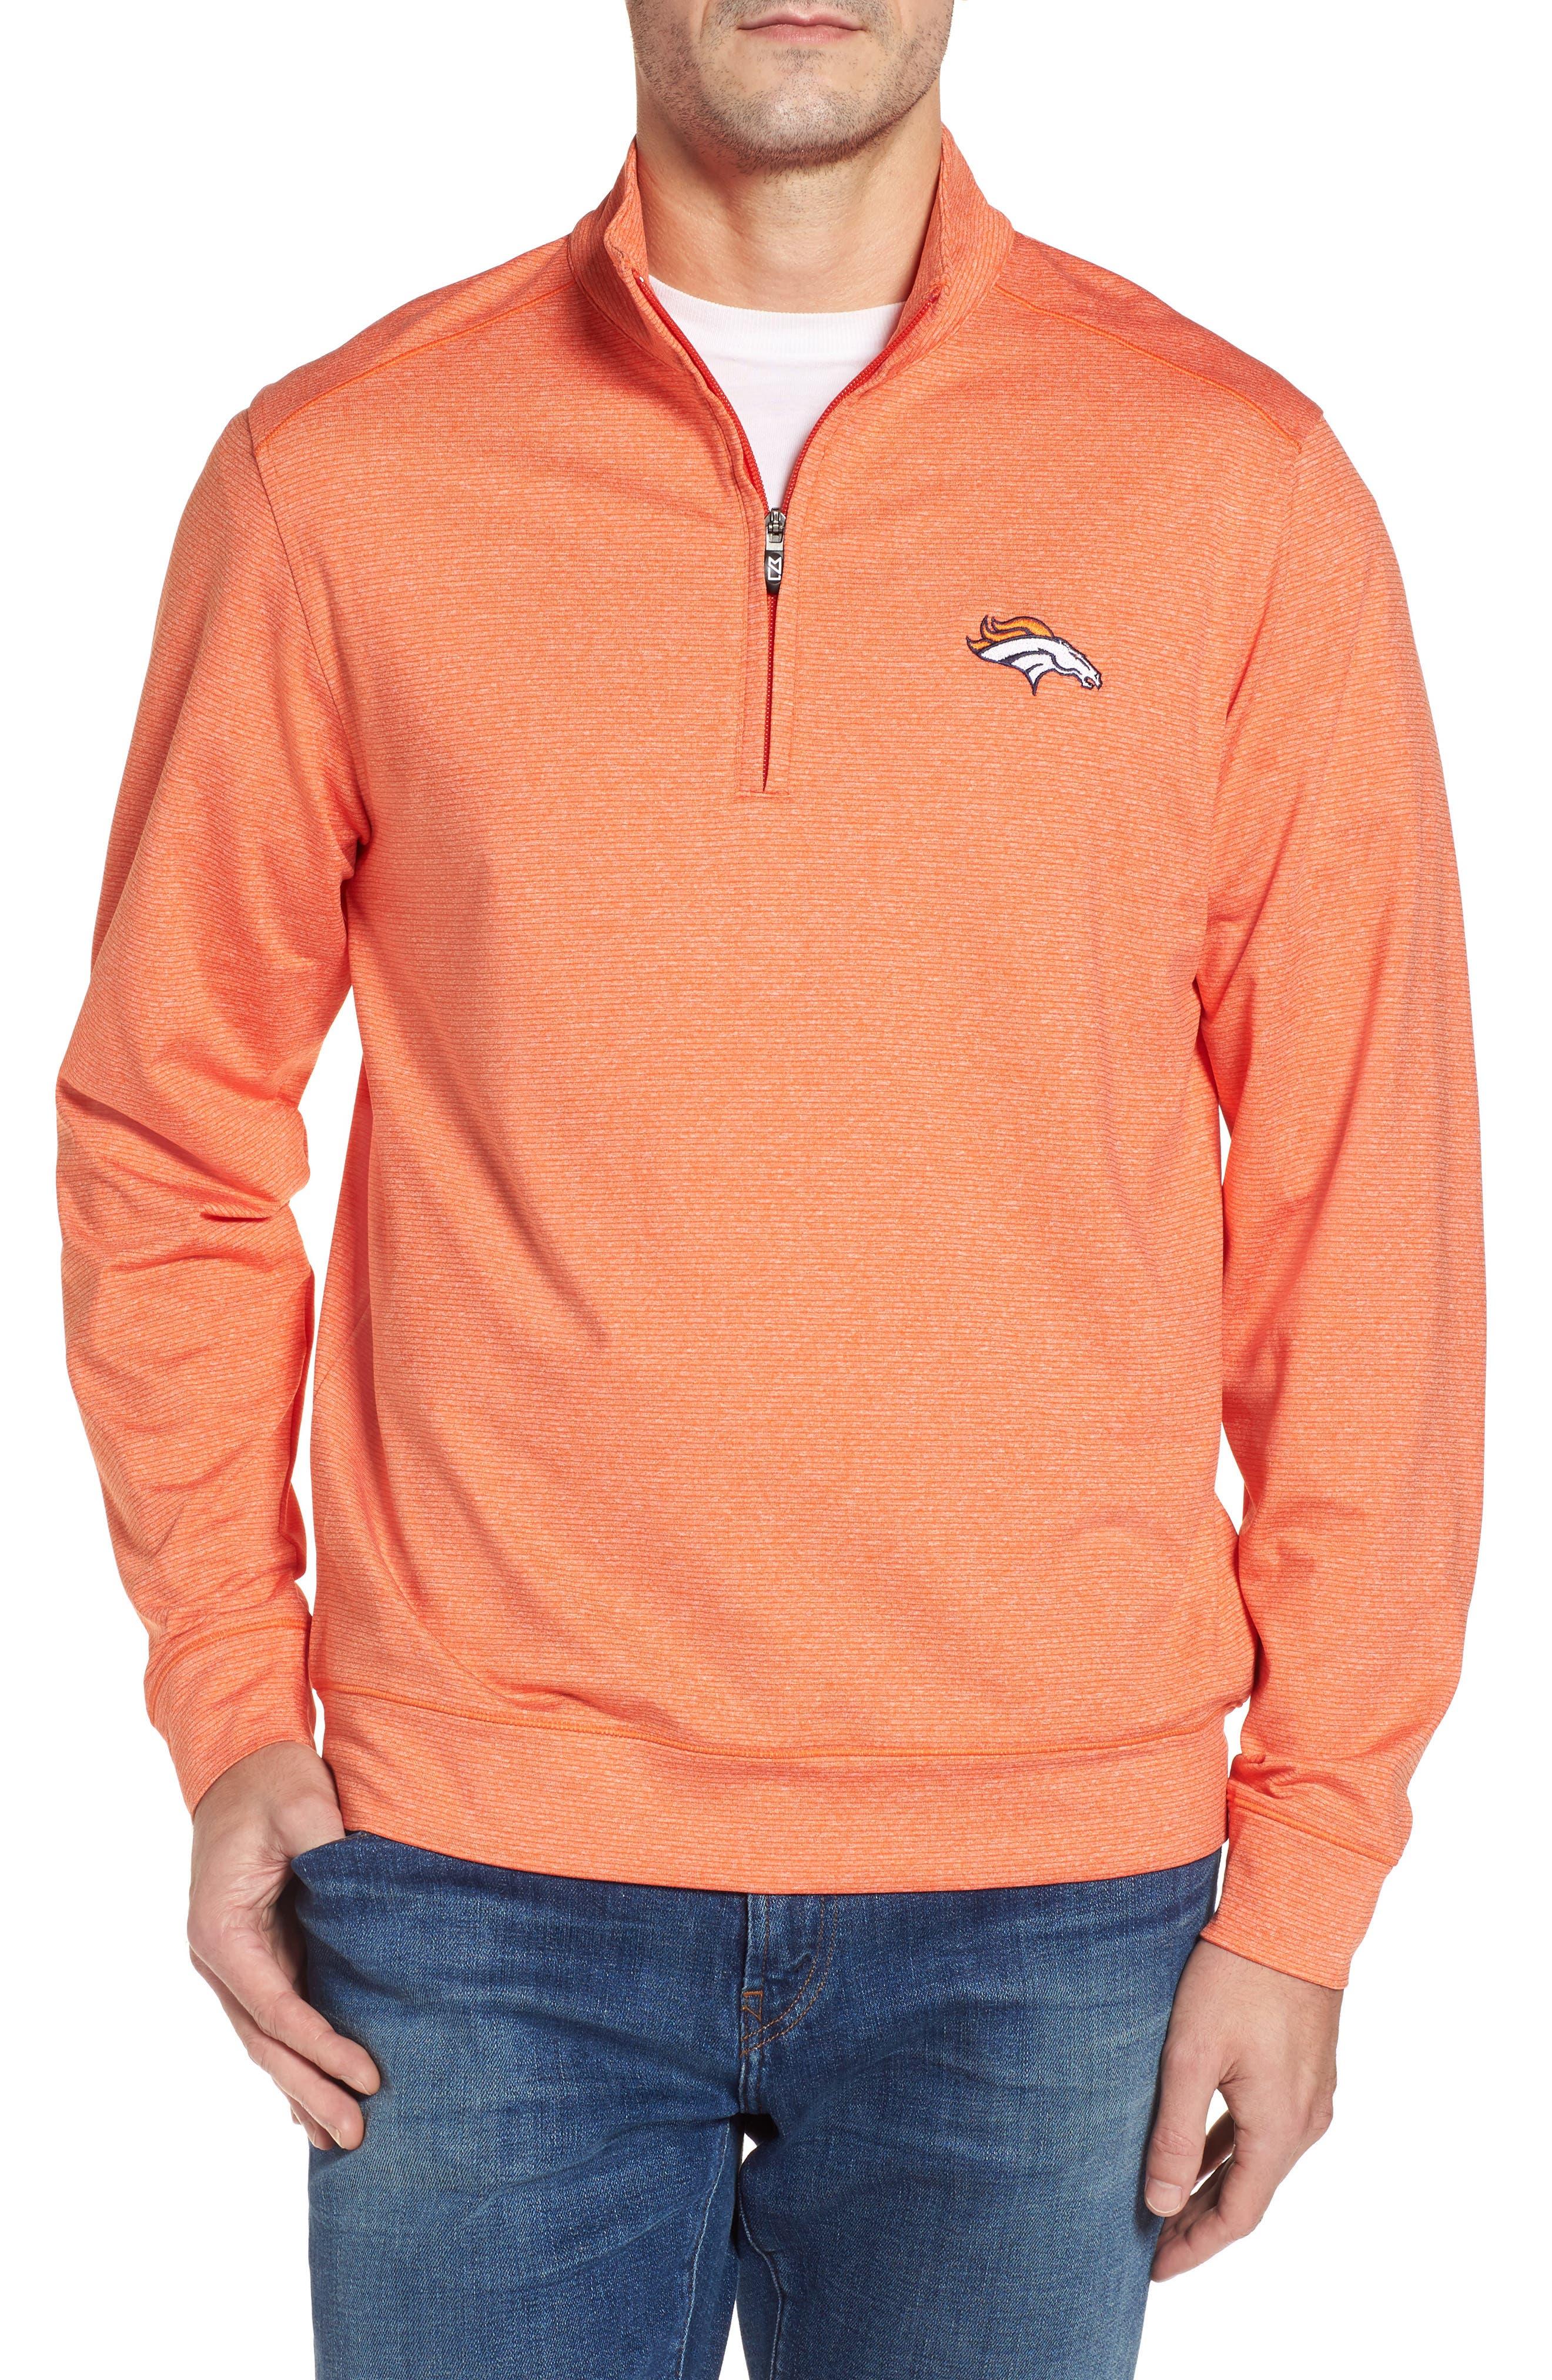 Shoreline - Denver Broncos Half Zip Pullover,                             Main thumbnail 1, color,                             College Orange Heather